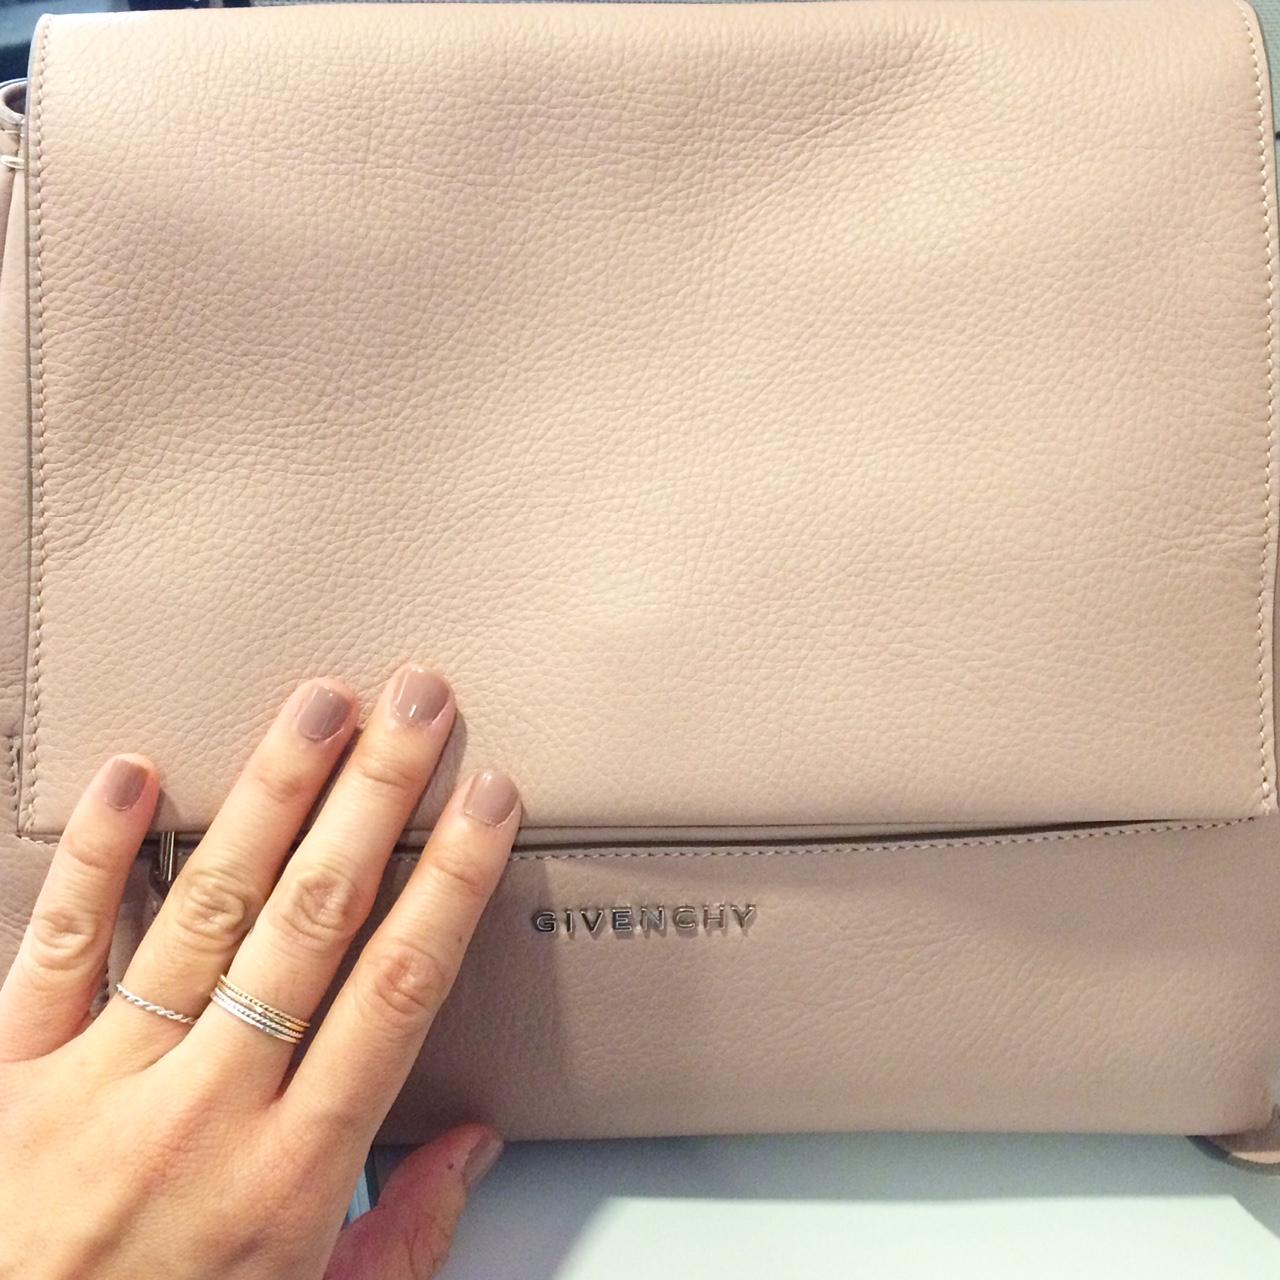 Givenchy Pandora Pure Small Flap Shoulder Bag  with  Sephora Formula X Nail Polish in Evocative